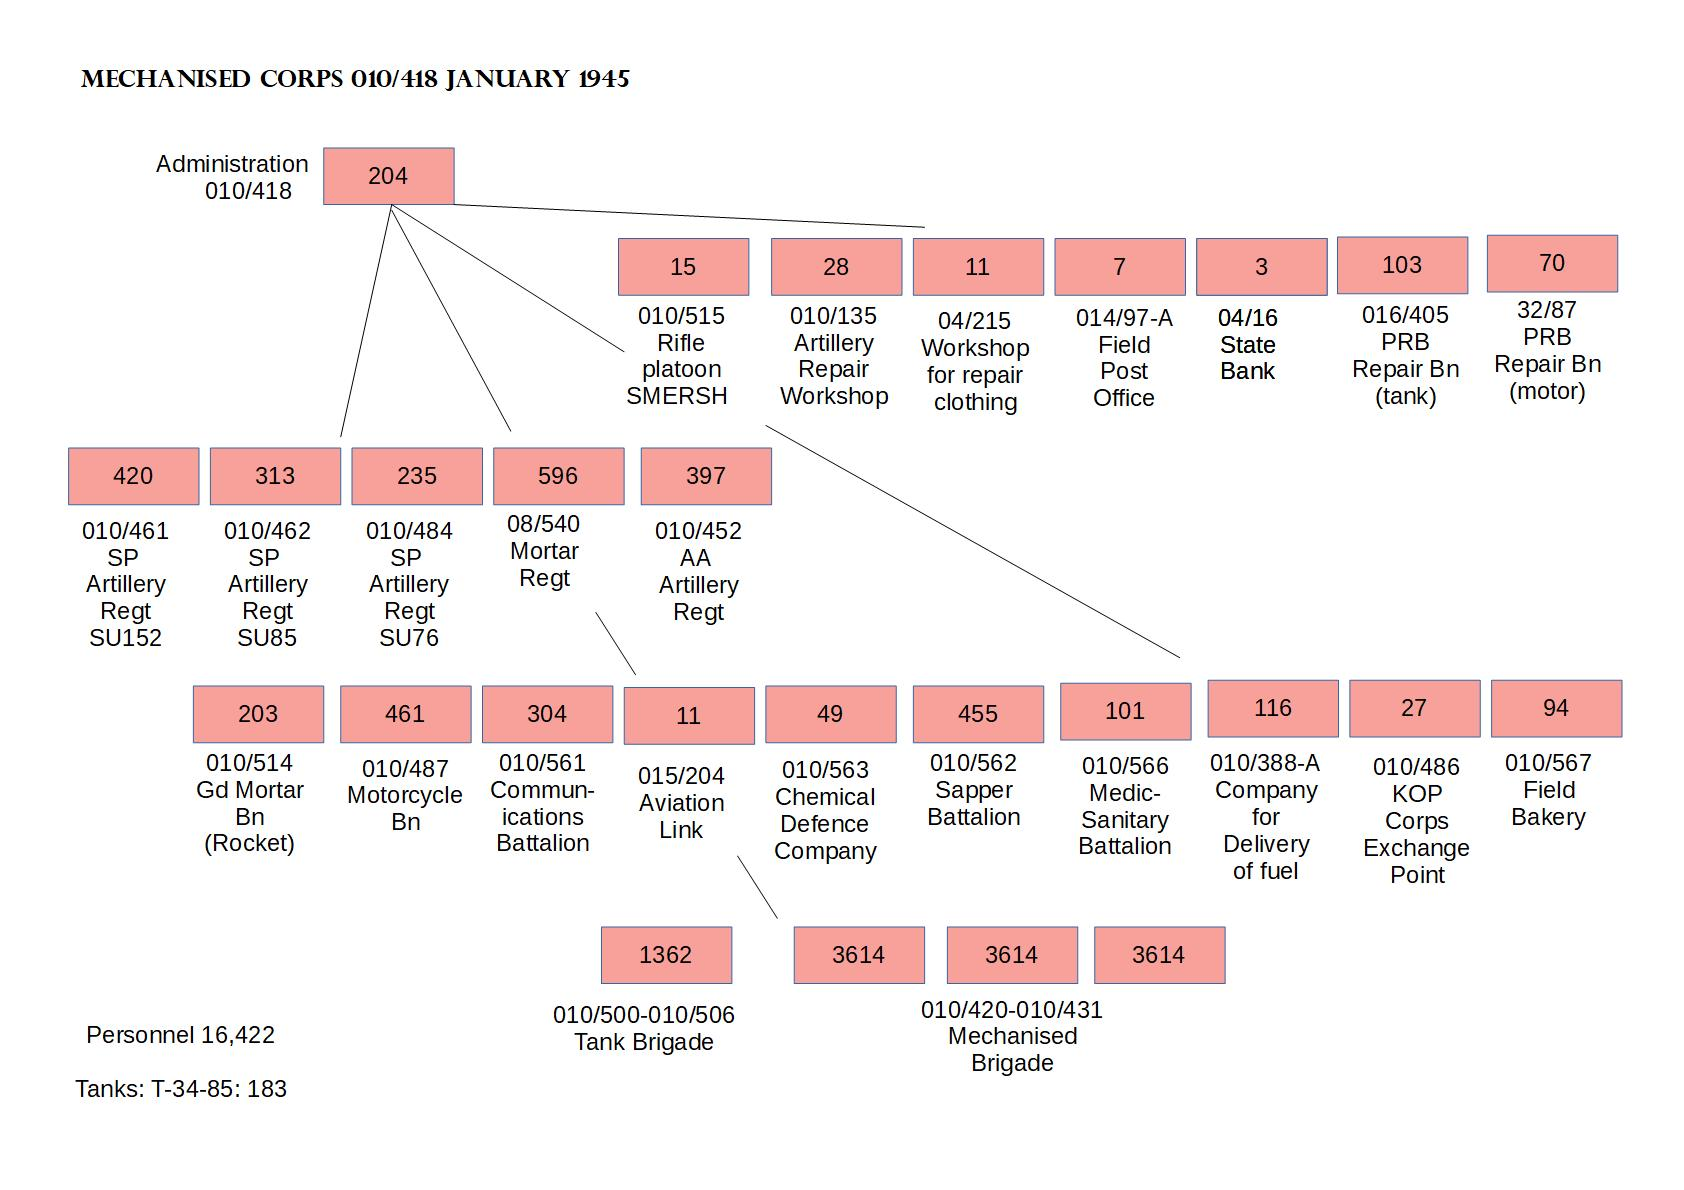 Scheme № 8 Organisation of Mechanised Corps on 1st January 1945